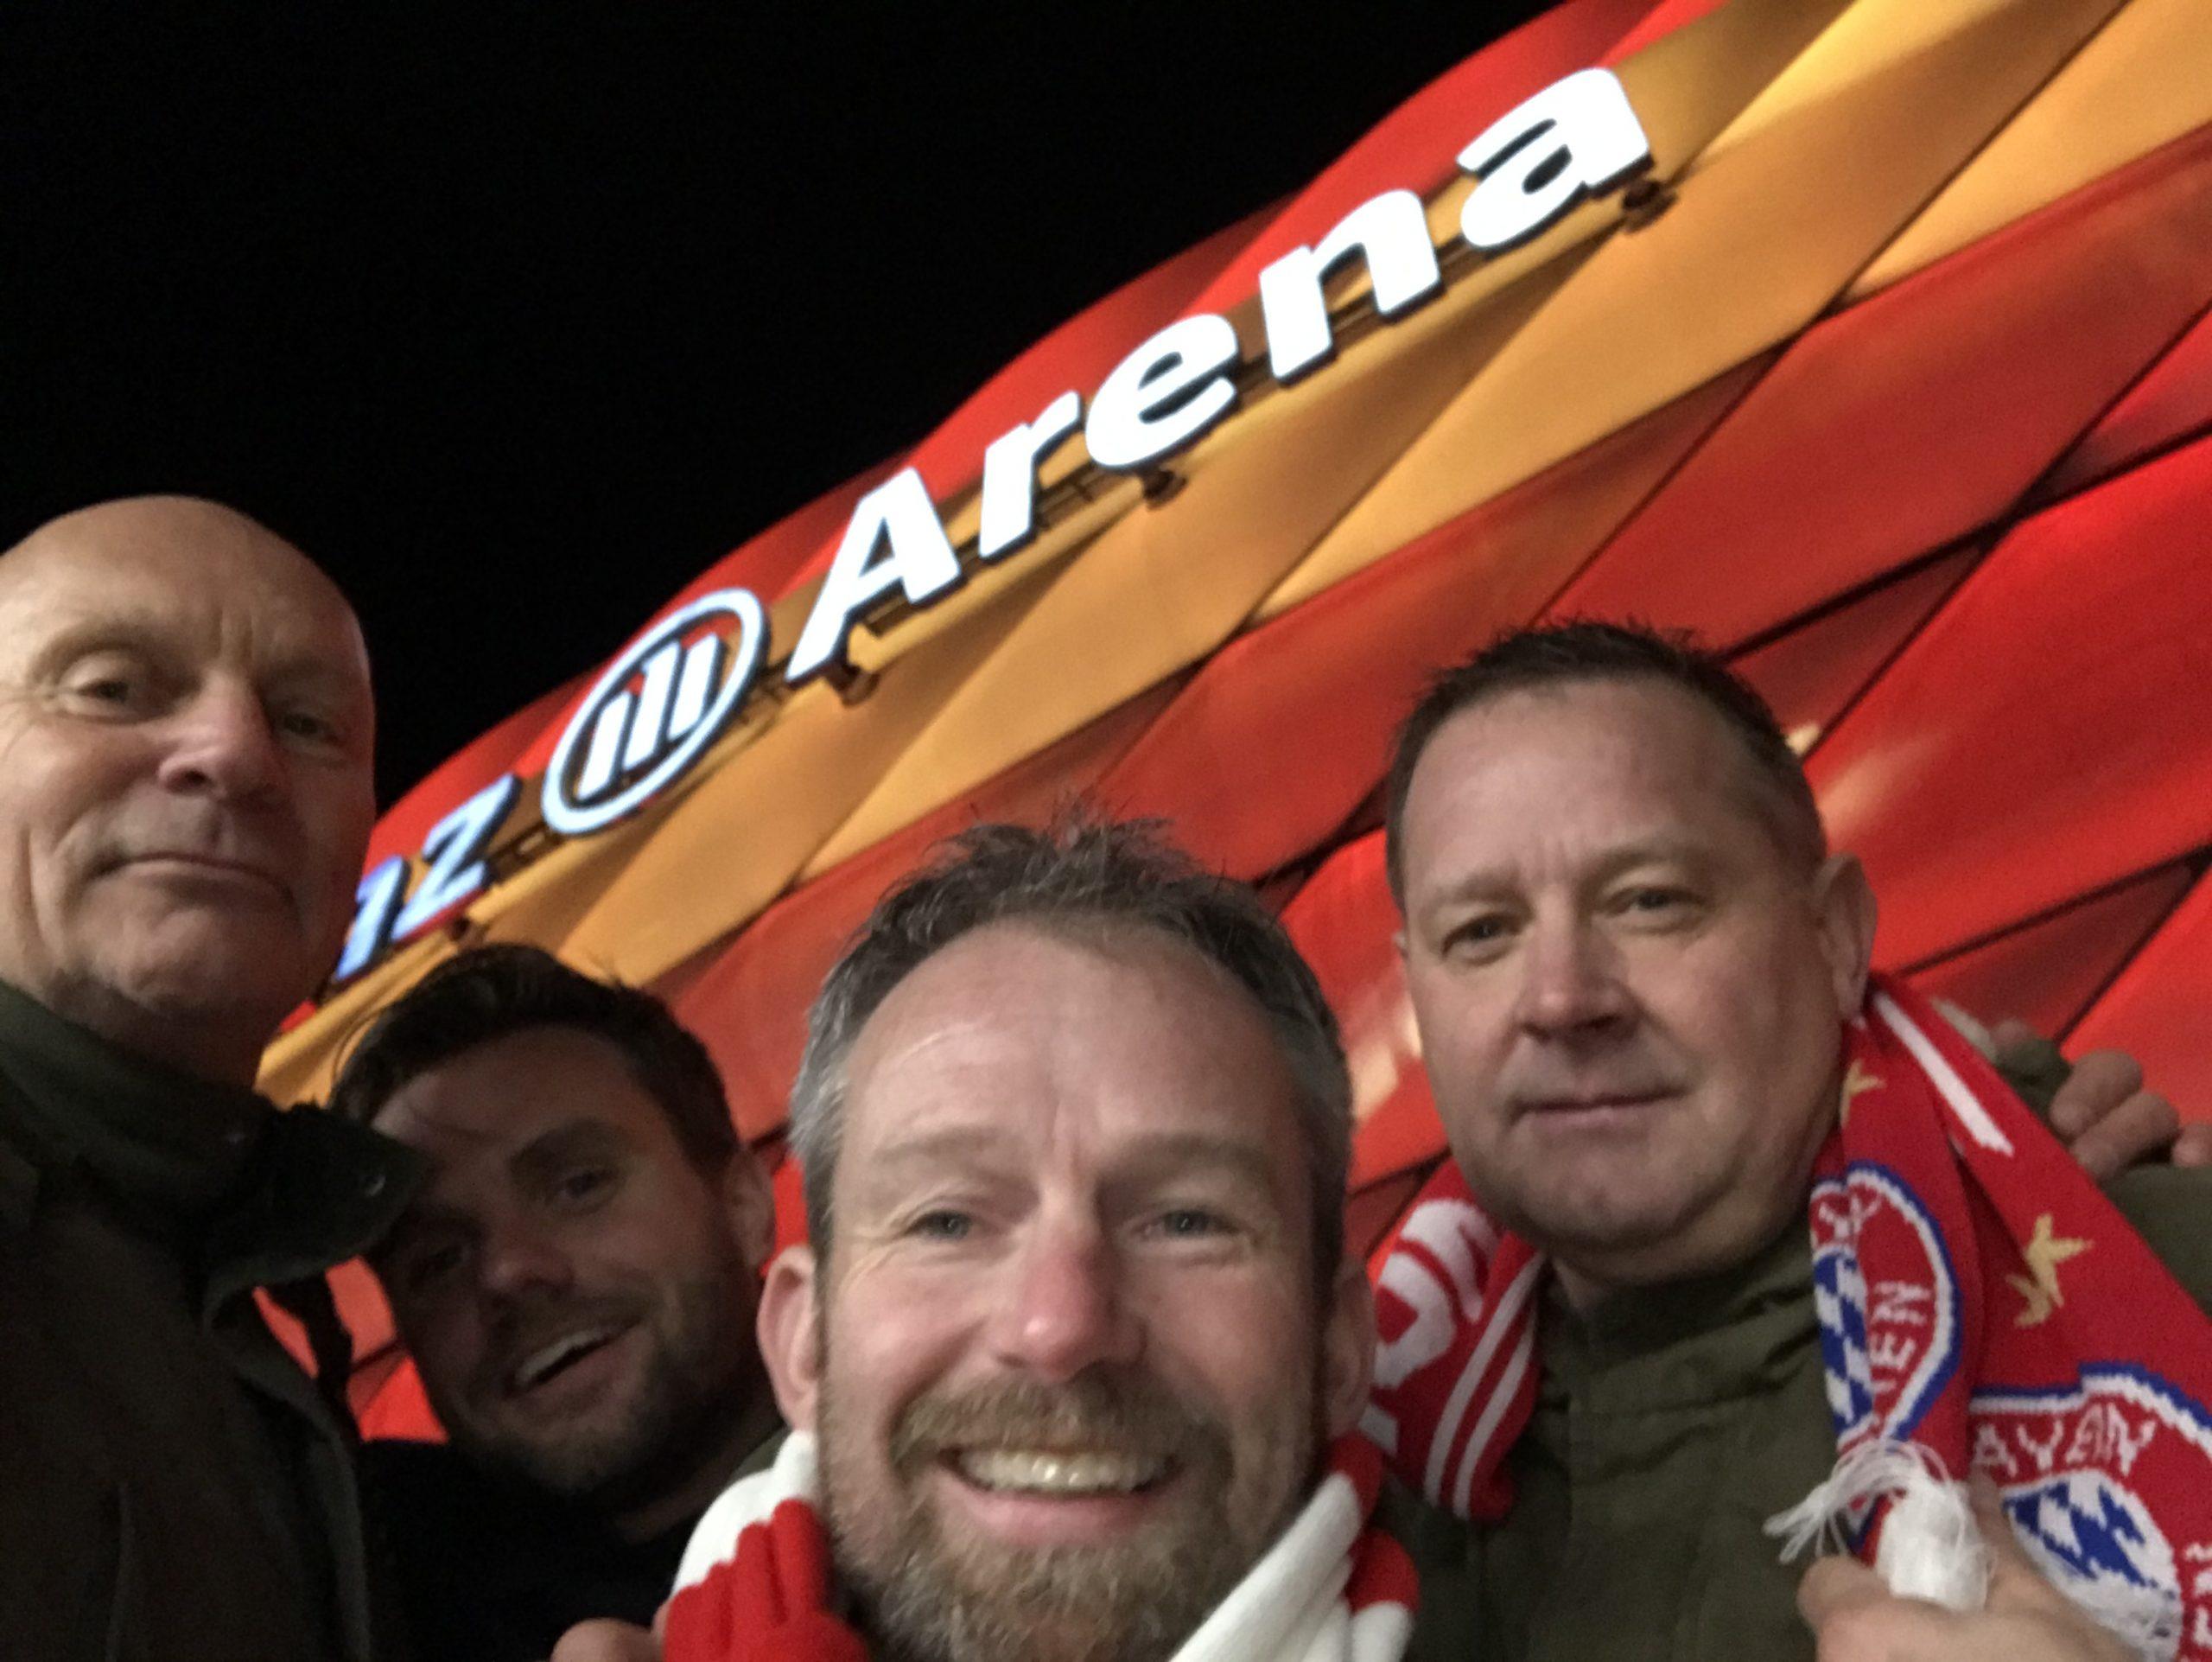 Wedstrijddag FC Bayern München